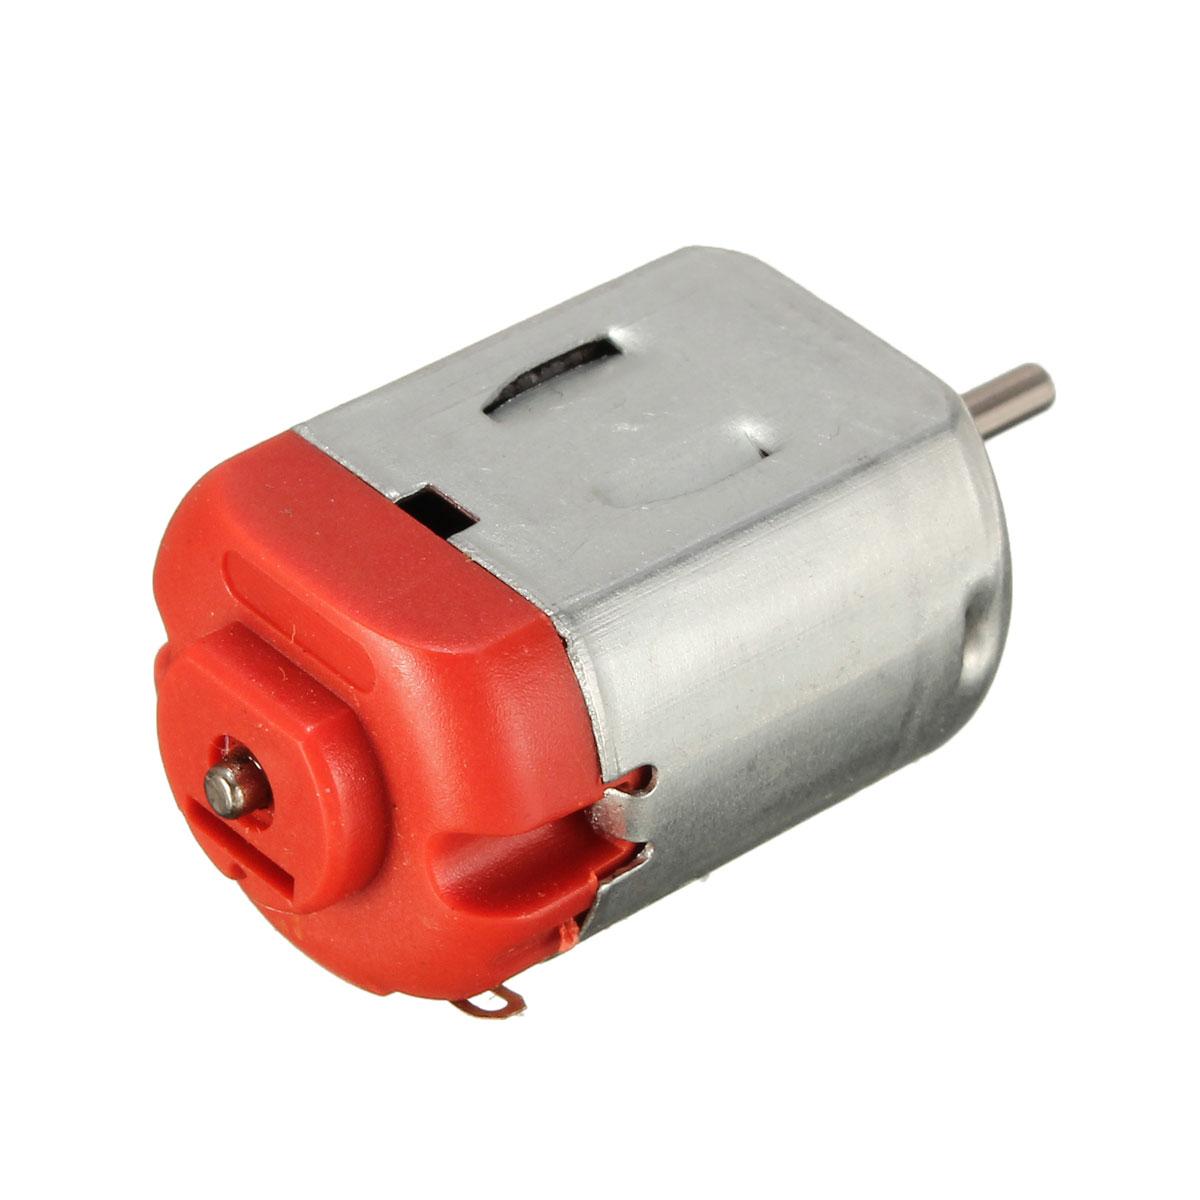 Об / мин 3-6В постоянного тока 0.35-0.4A R130 Мотор 130 Hobby Micro Мотор